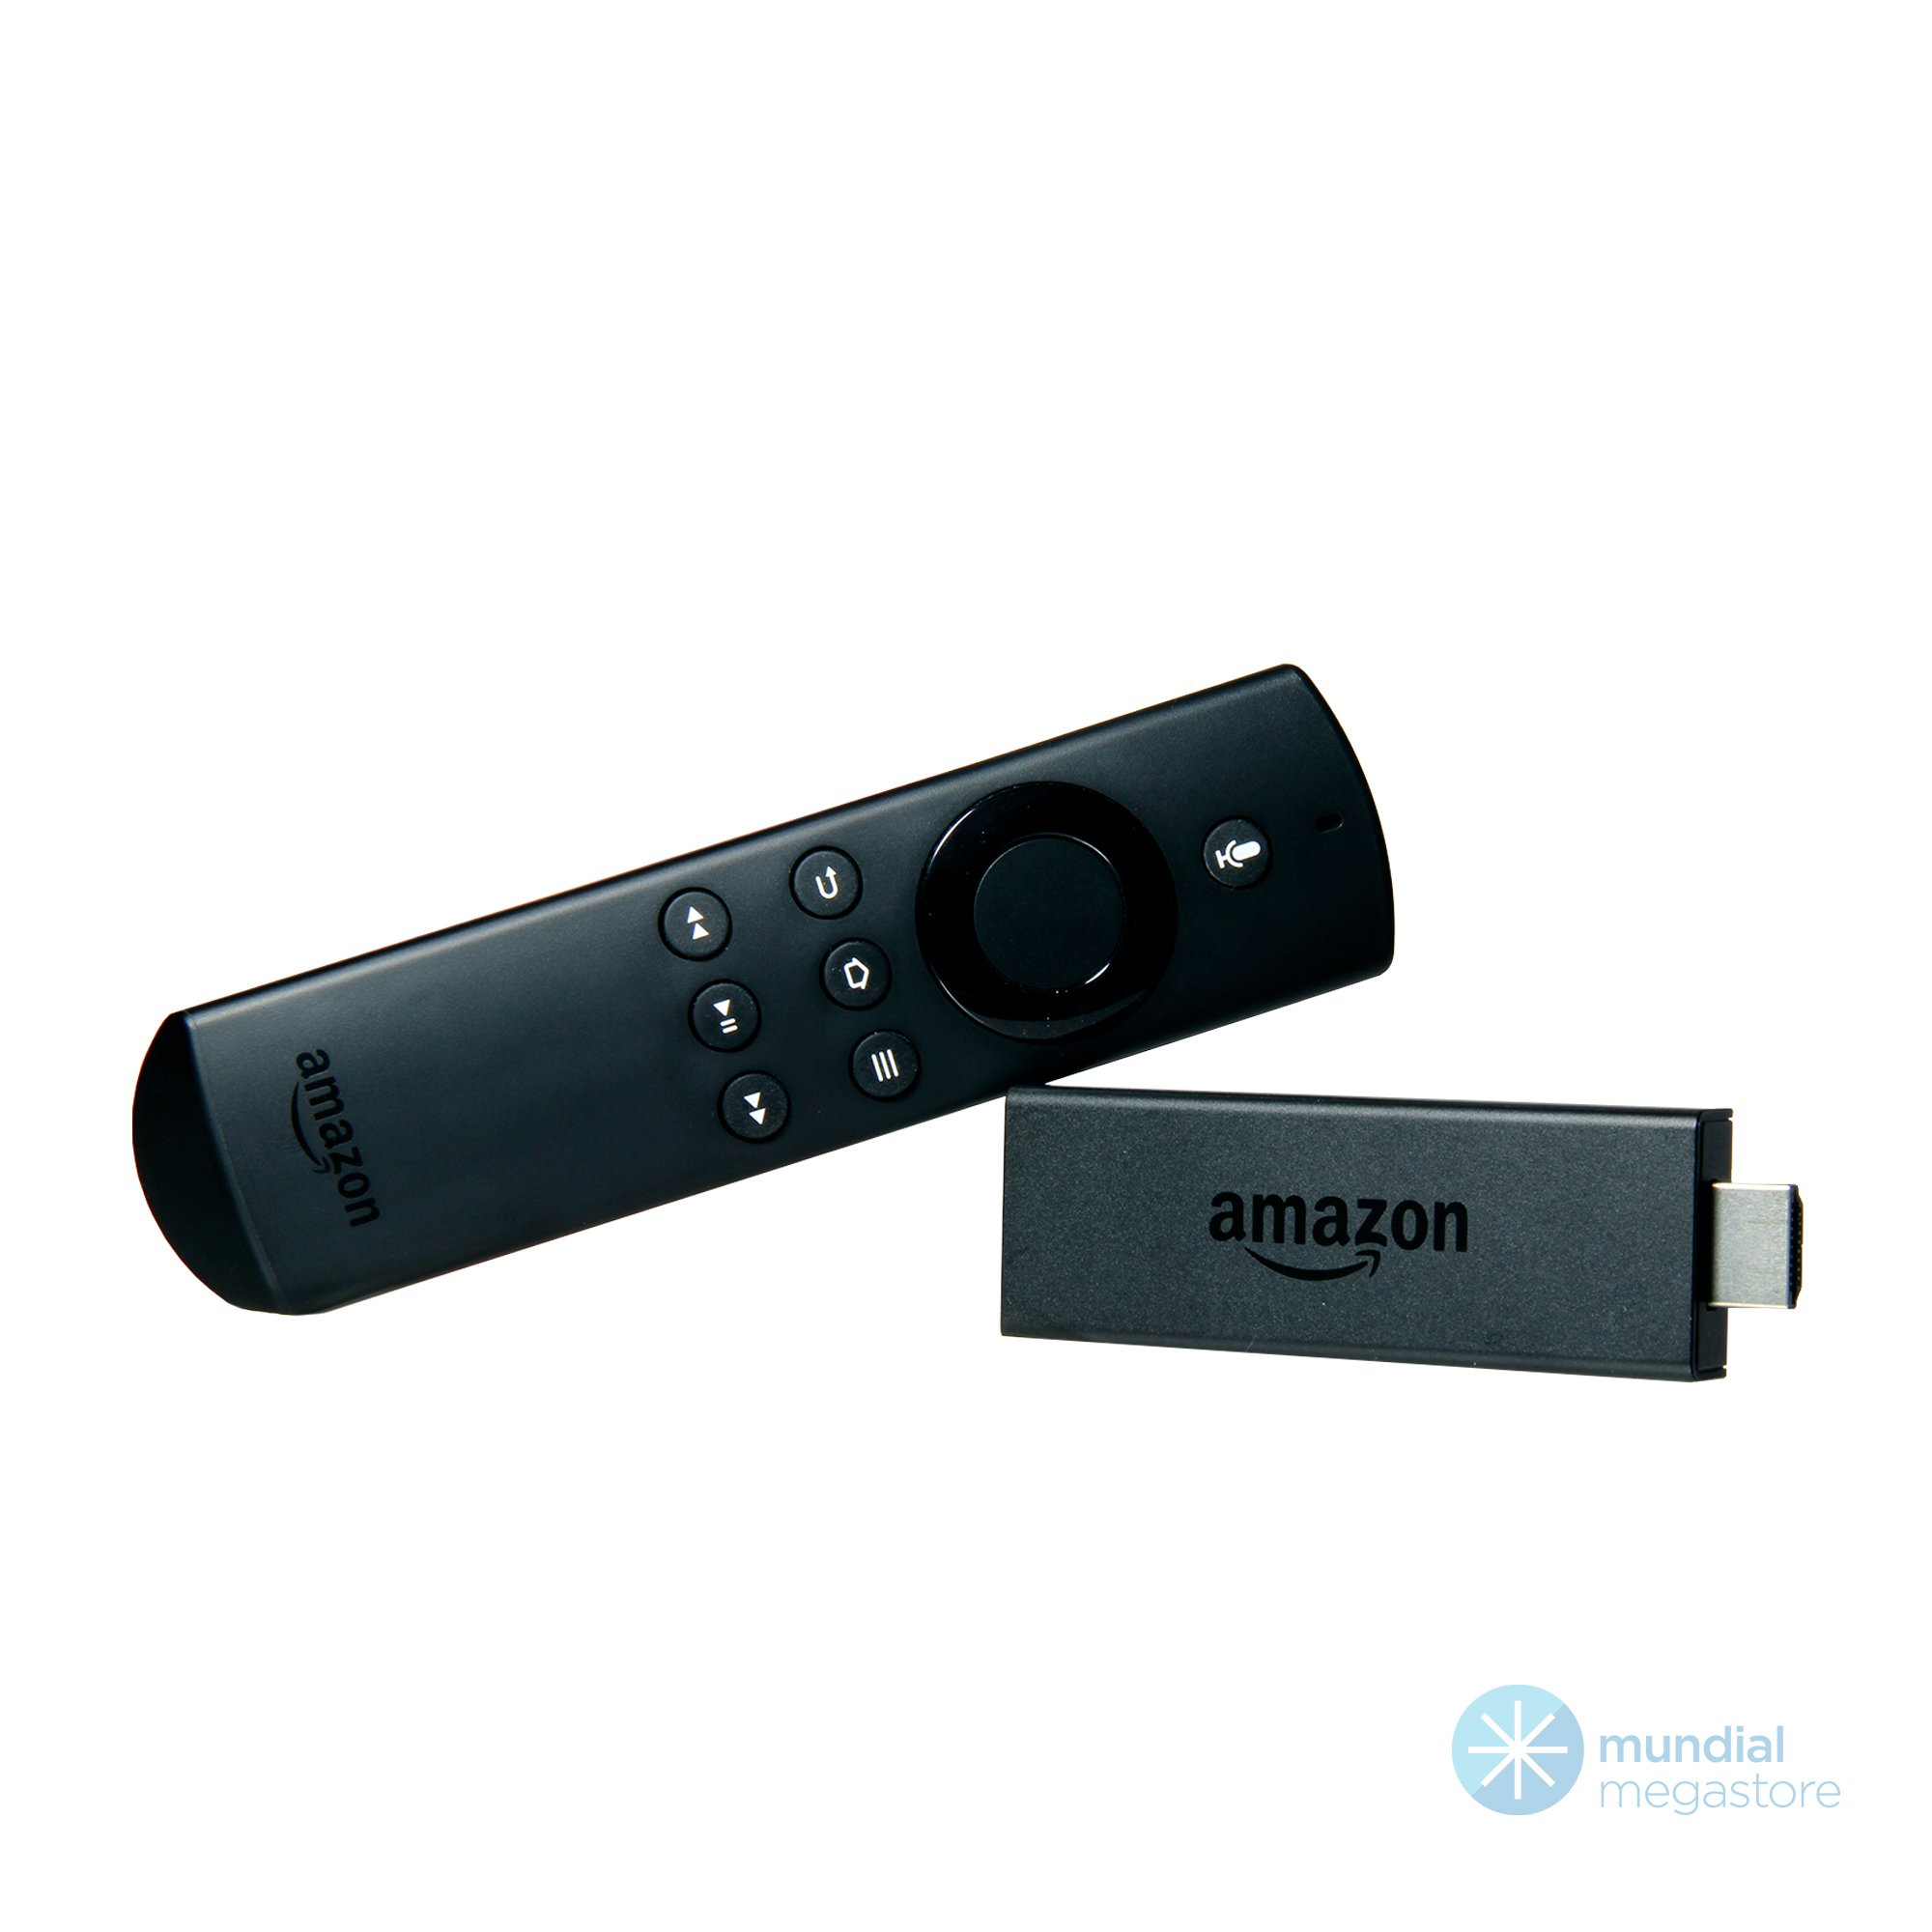 receptor conversor smart fire tv stick amazon 46437 2000 196054